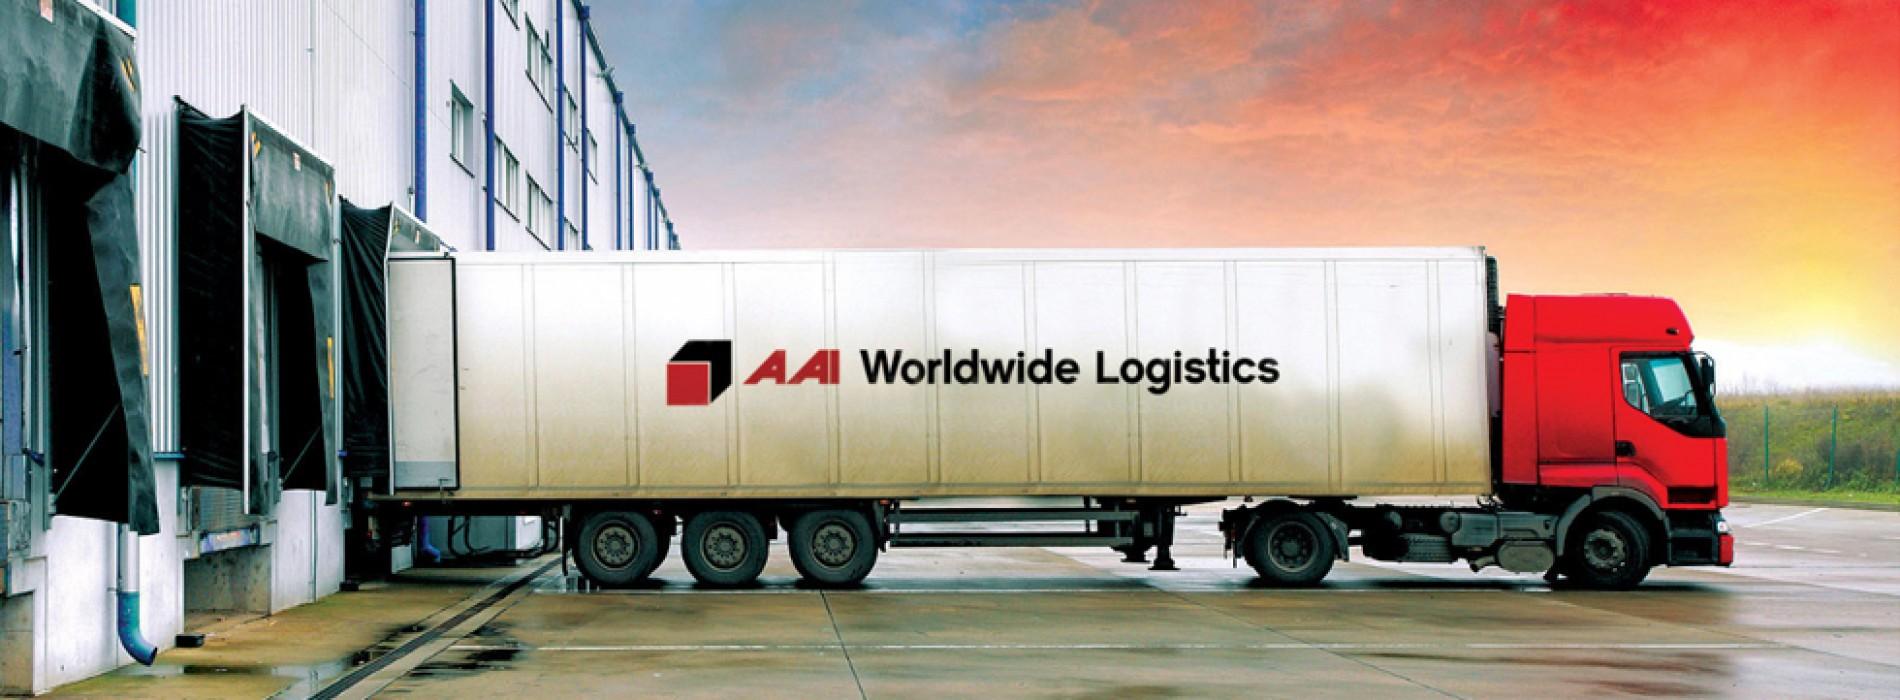 AAI Worldwide Logistics goes live on Ramco ERP across 7 operating units